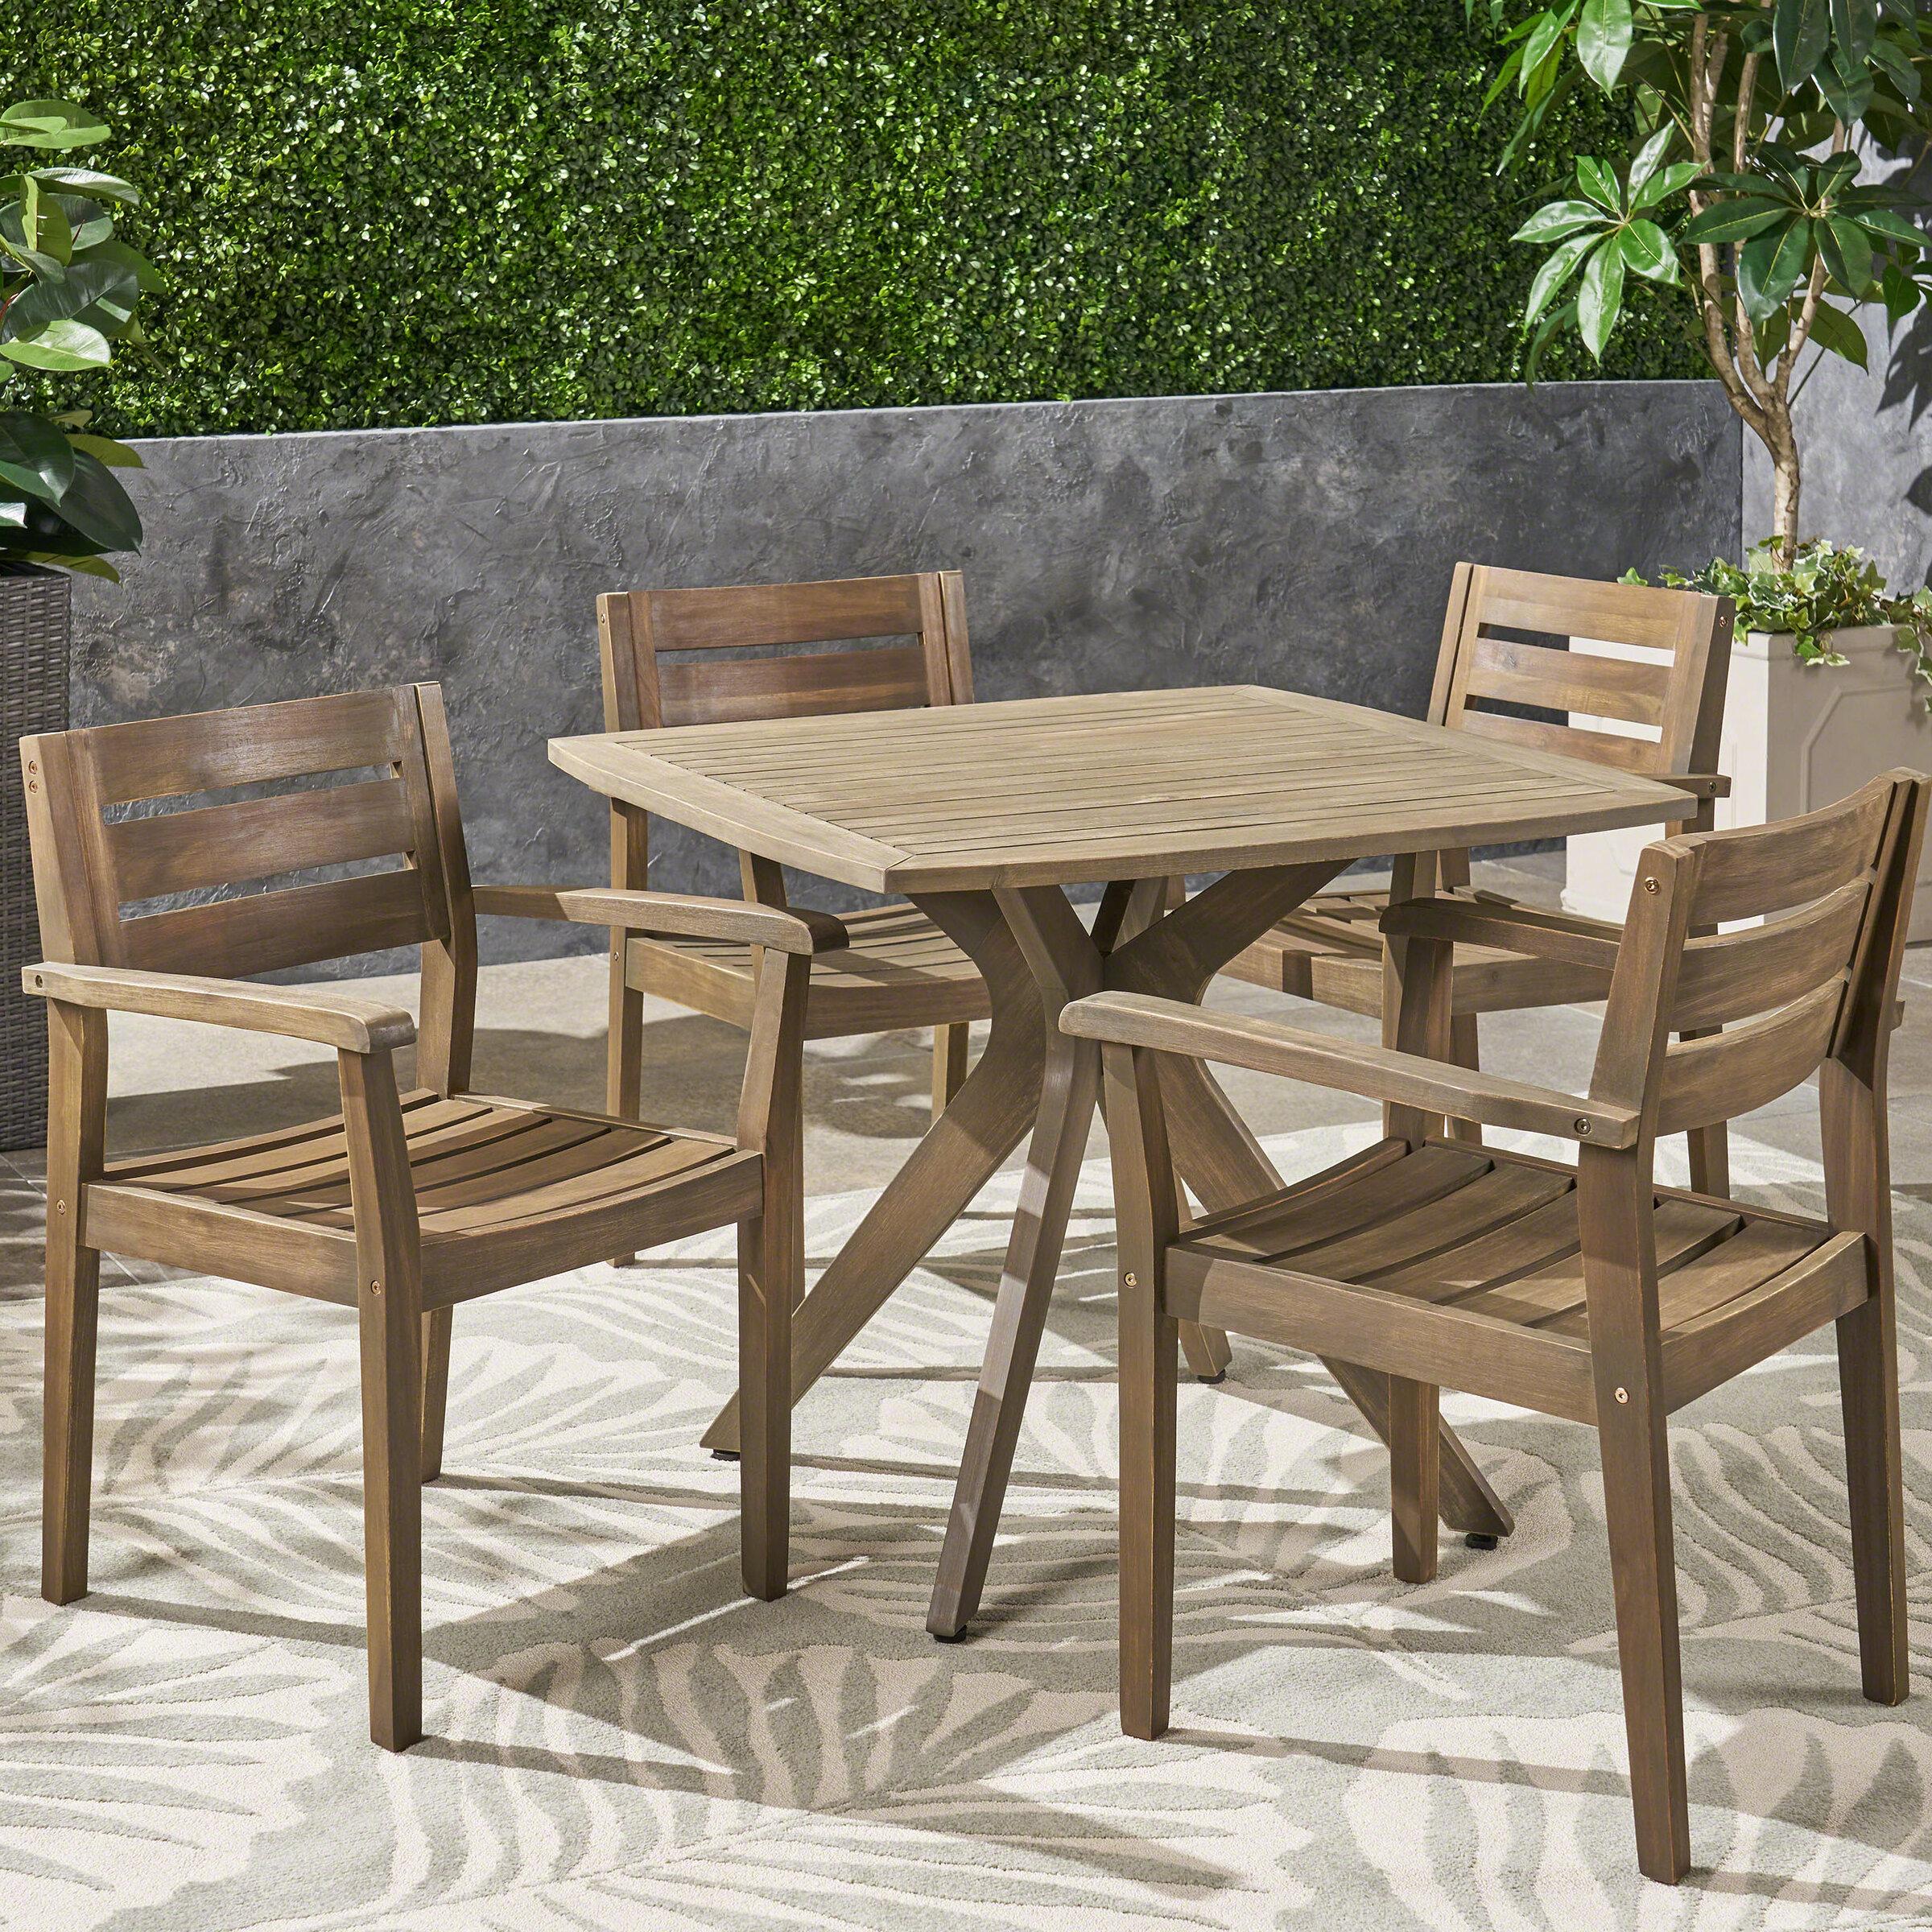 Brilliant Ramage Outdoor Acacia Wood 5 Piece Dining Set Lamtechconsult Wood Chair Design Ideas Lamtechconsultcom